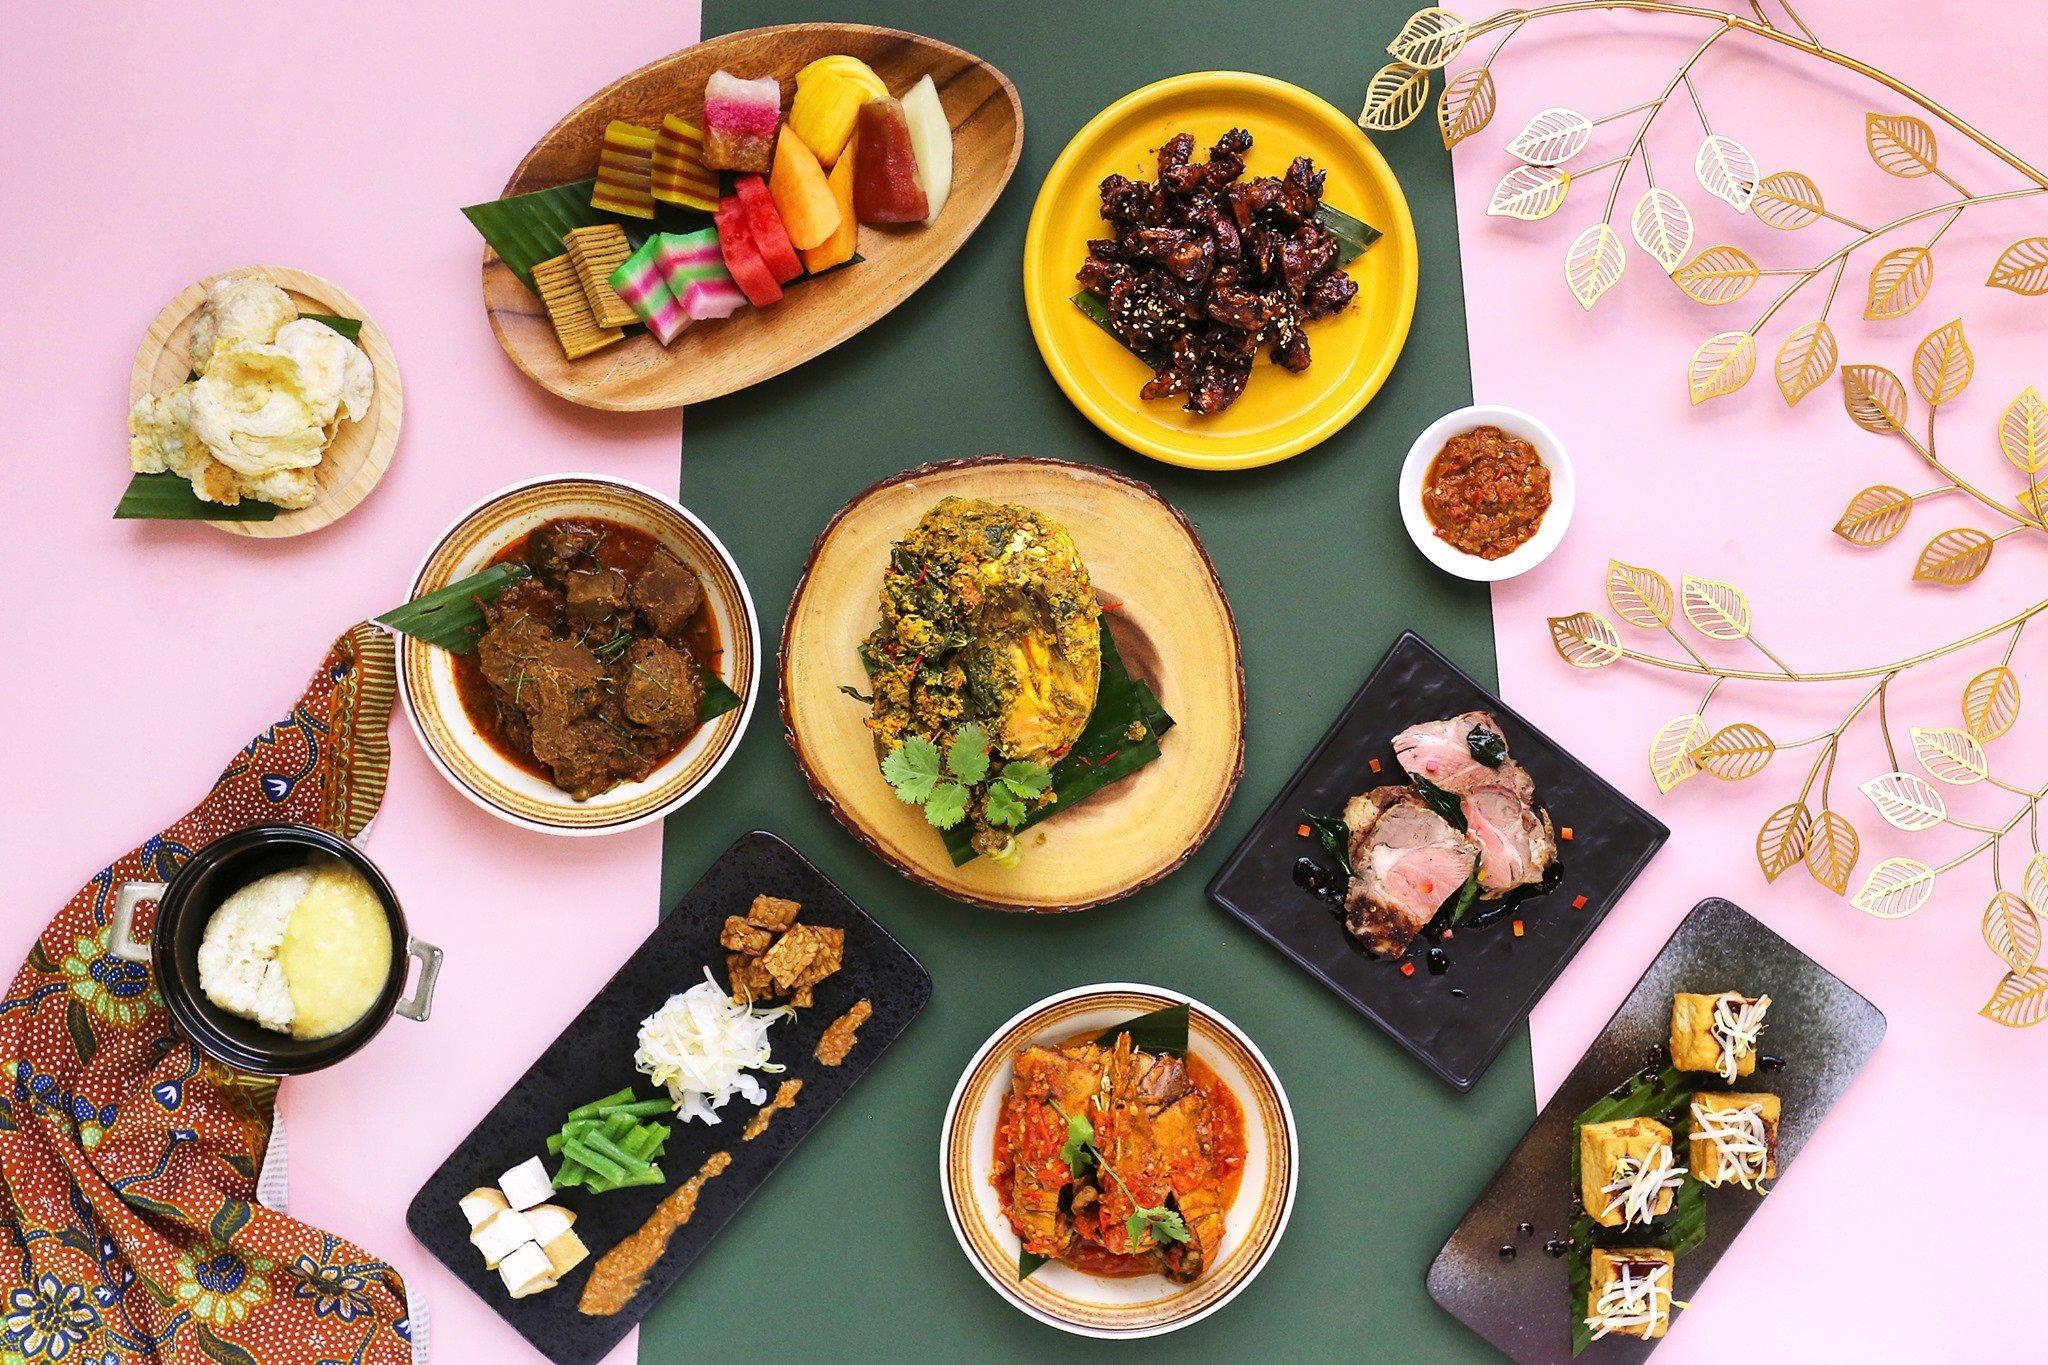 Kintamani Indonesian Restaurant, Halal Buffets in Singapore